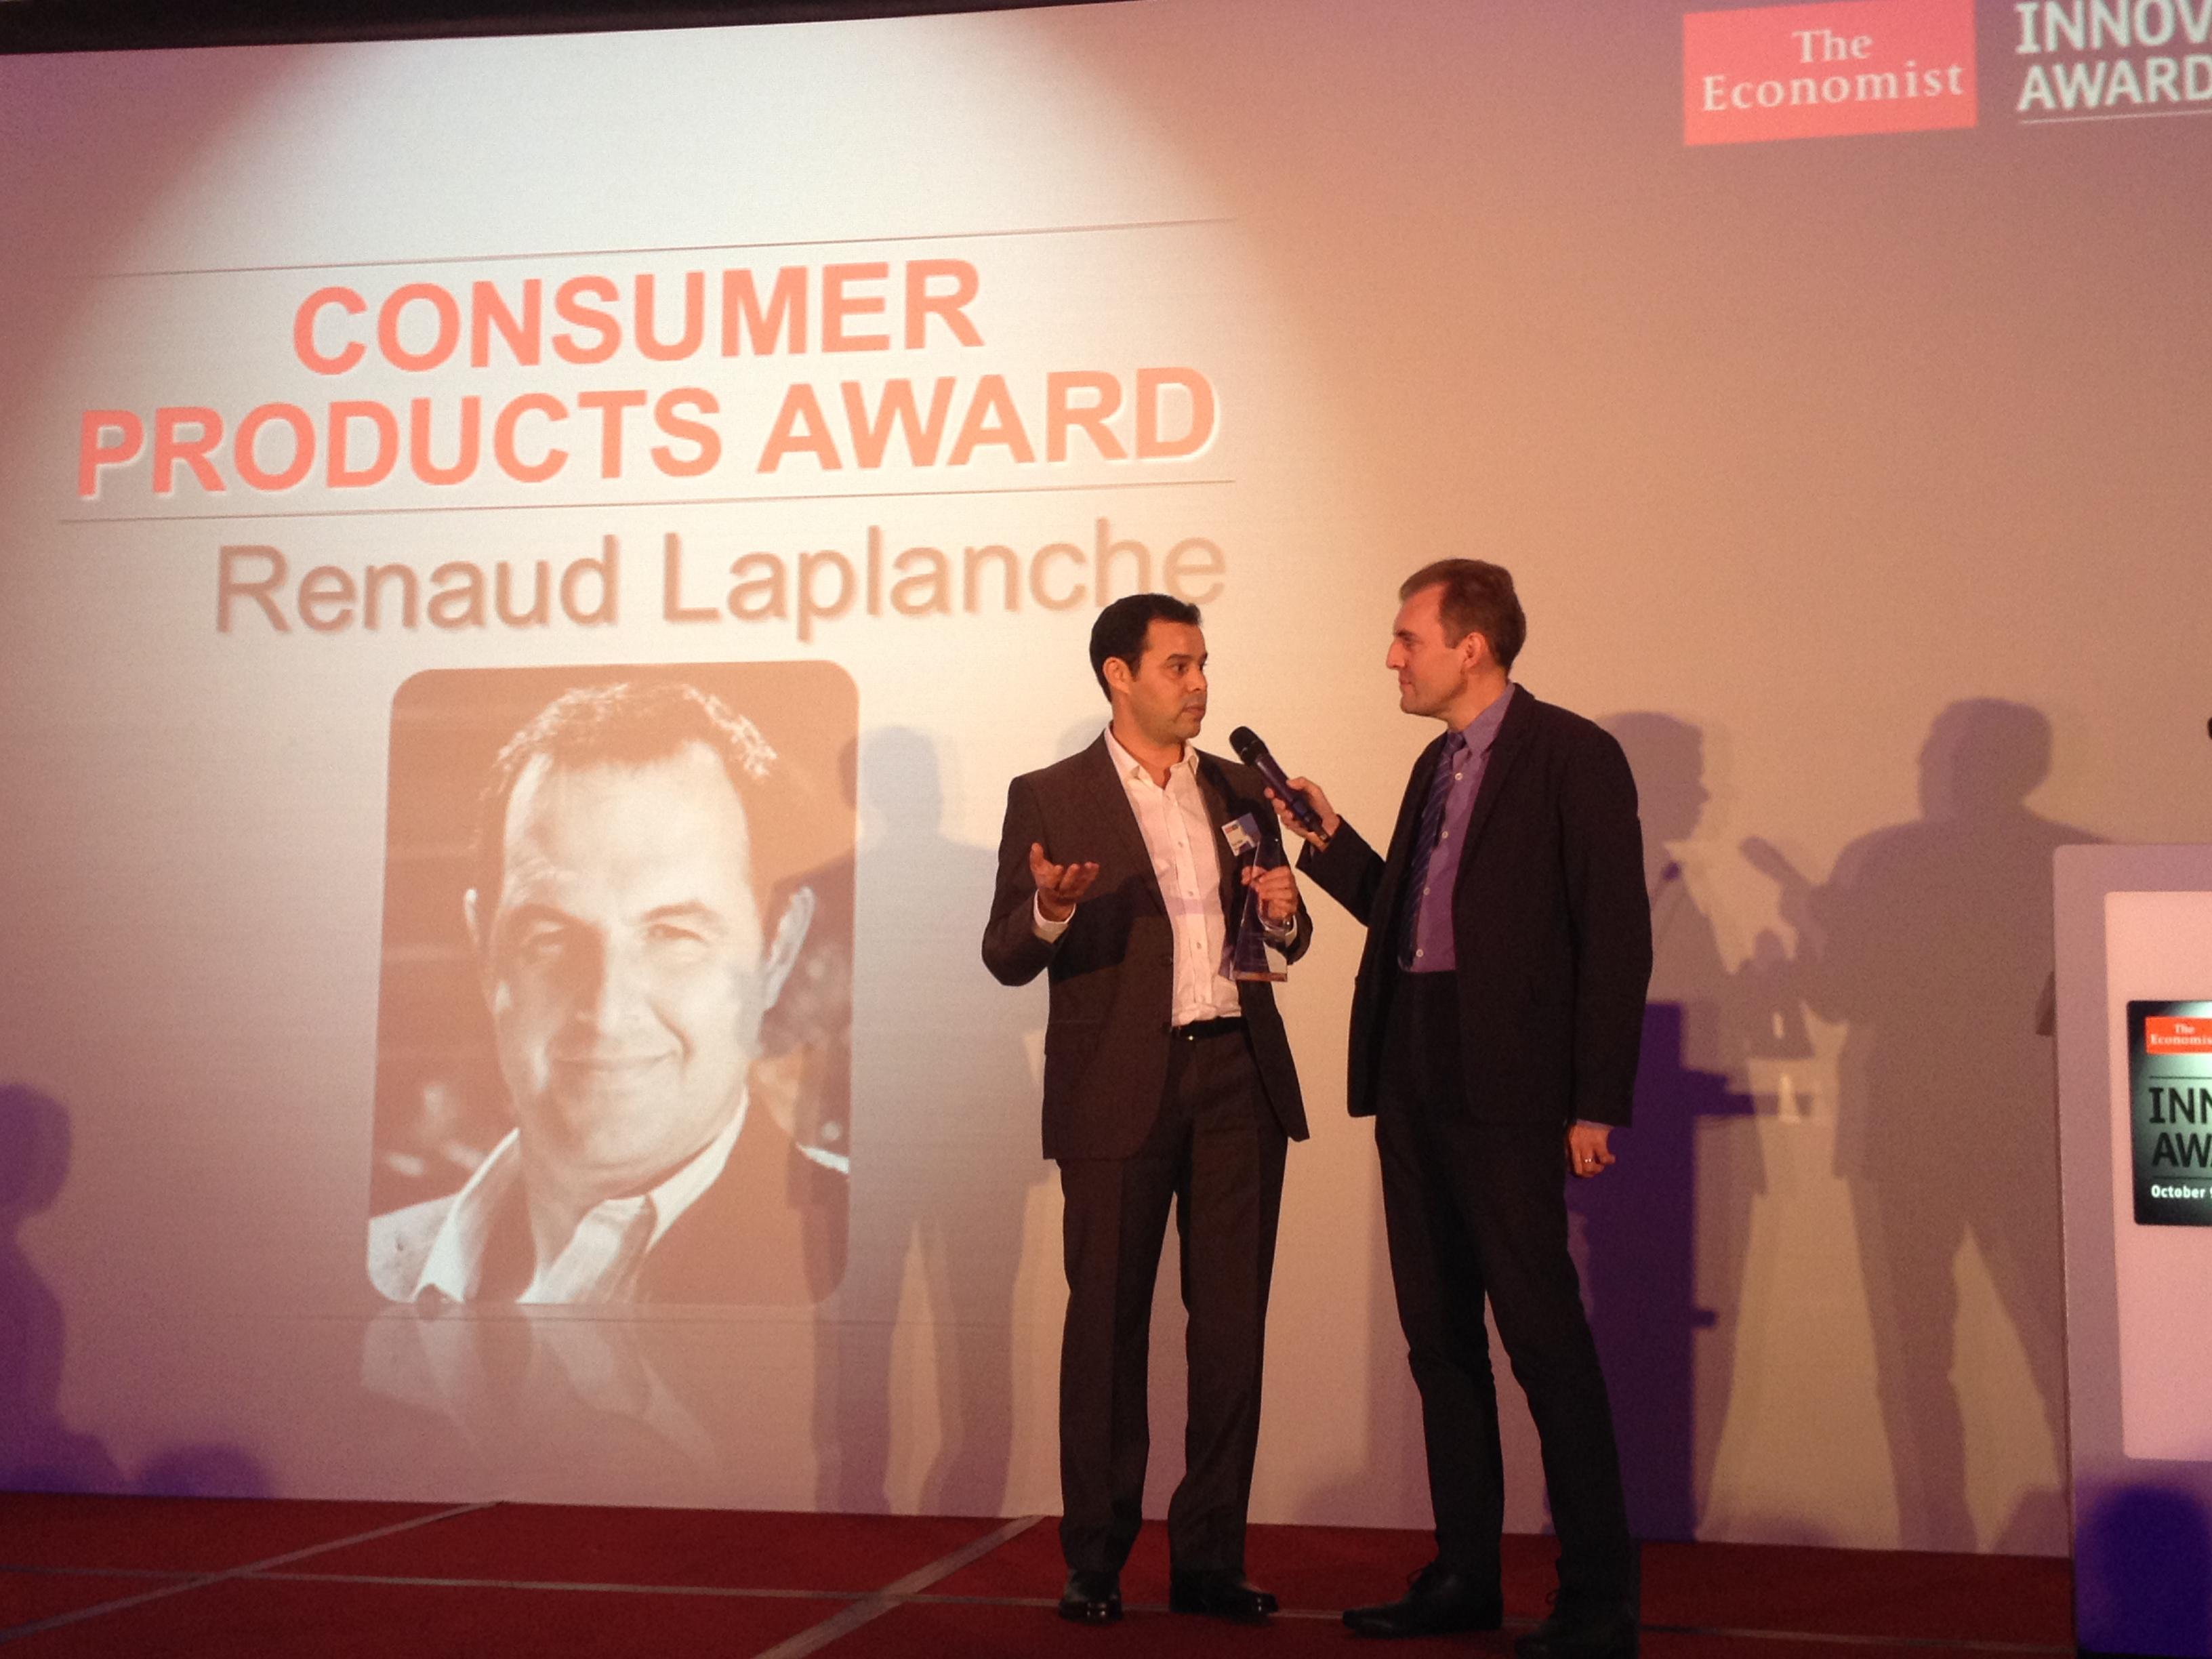 Economist Award Photo1